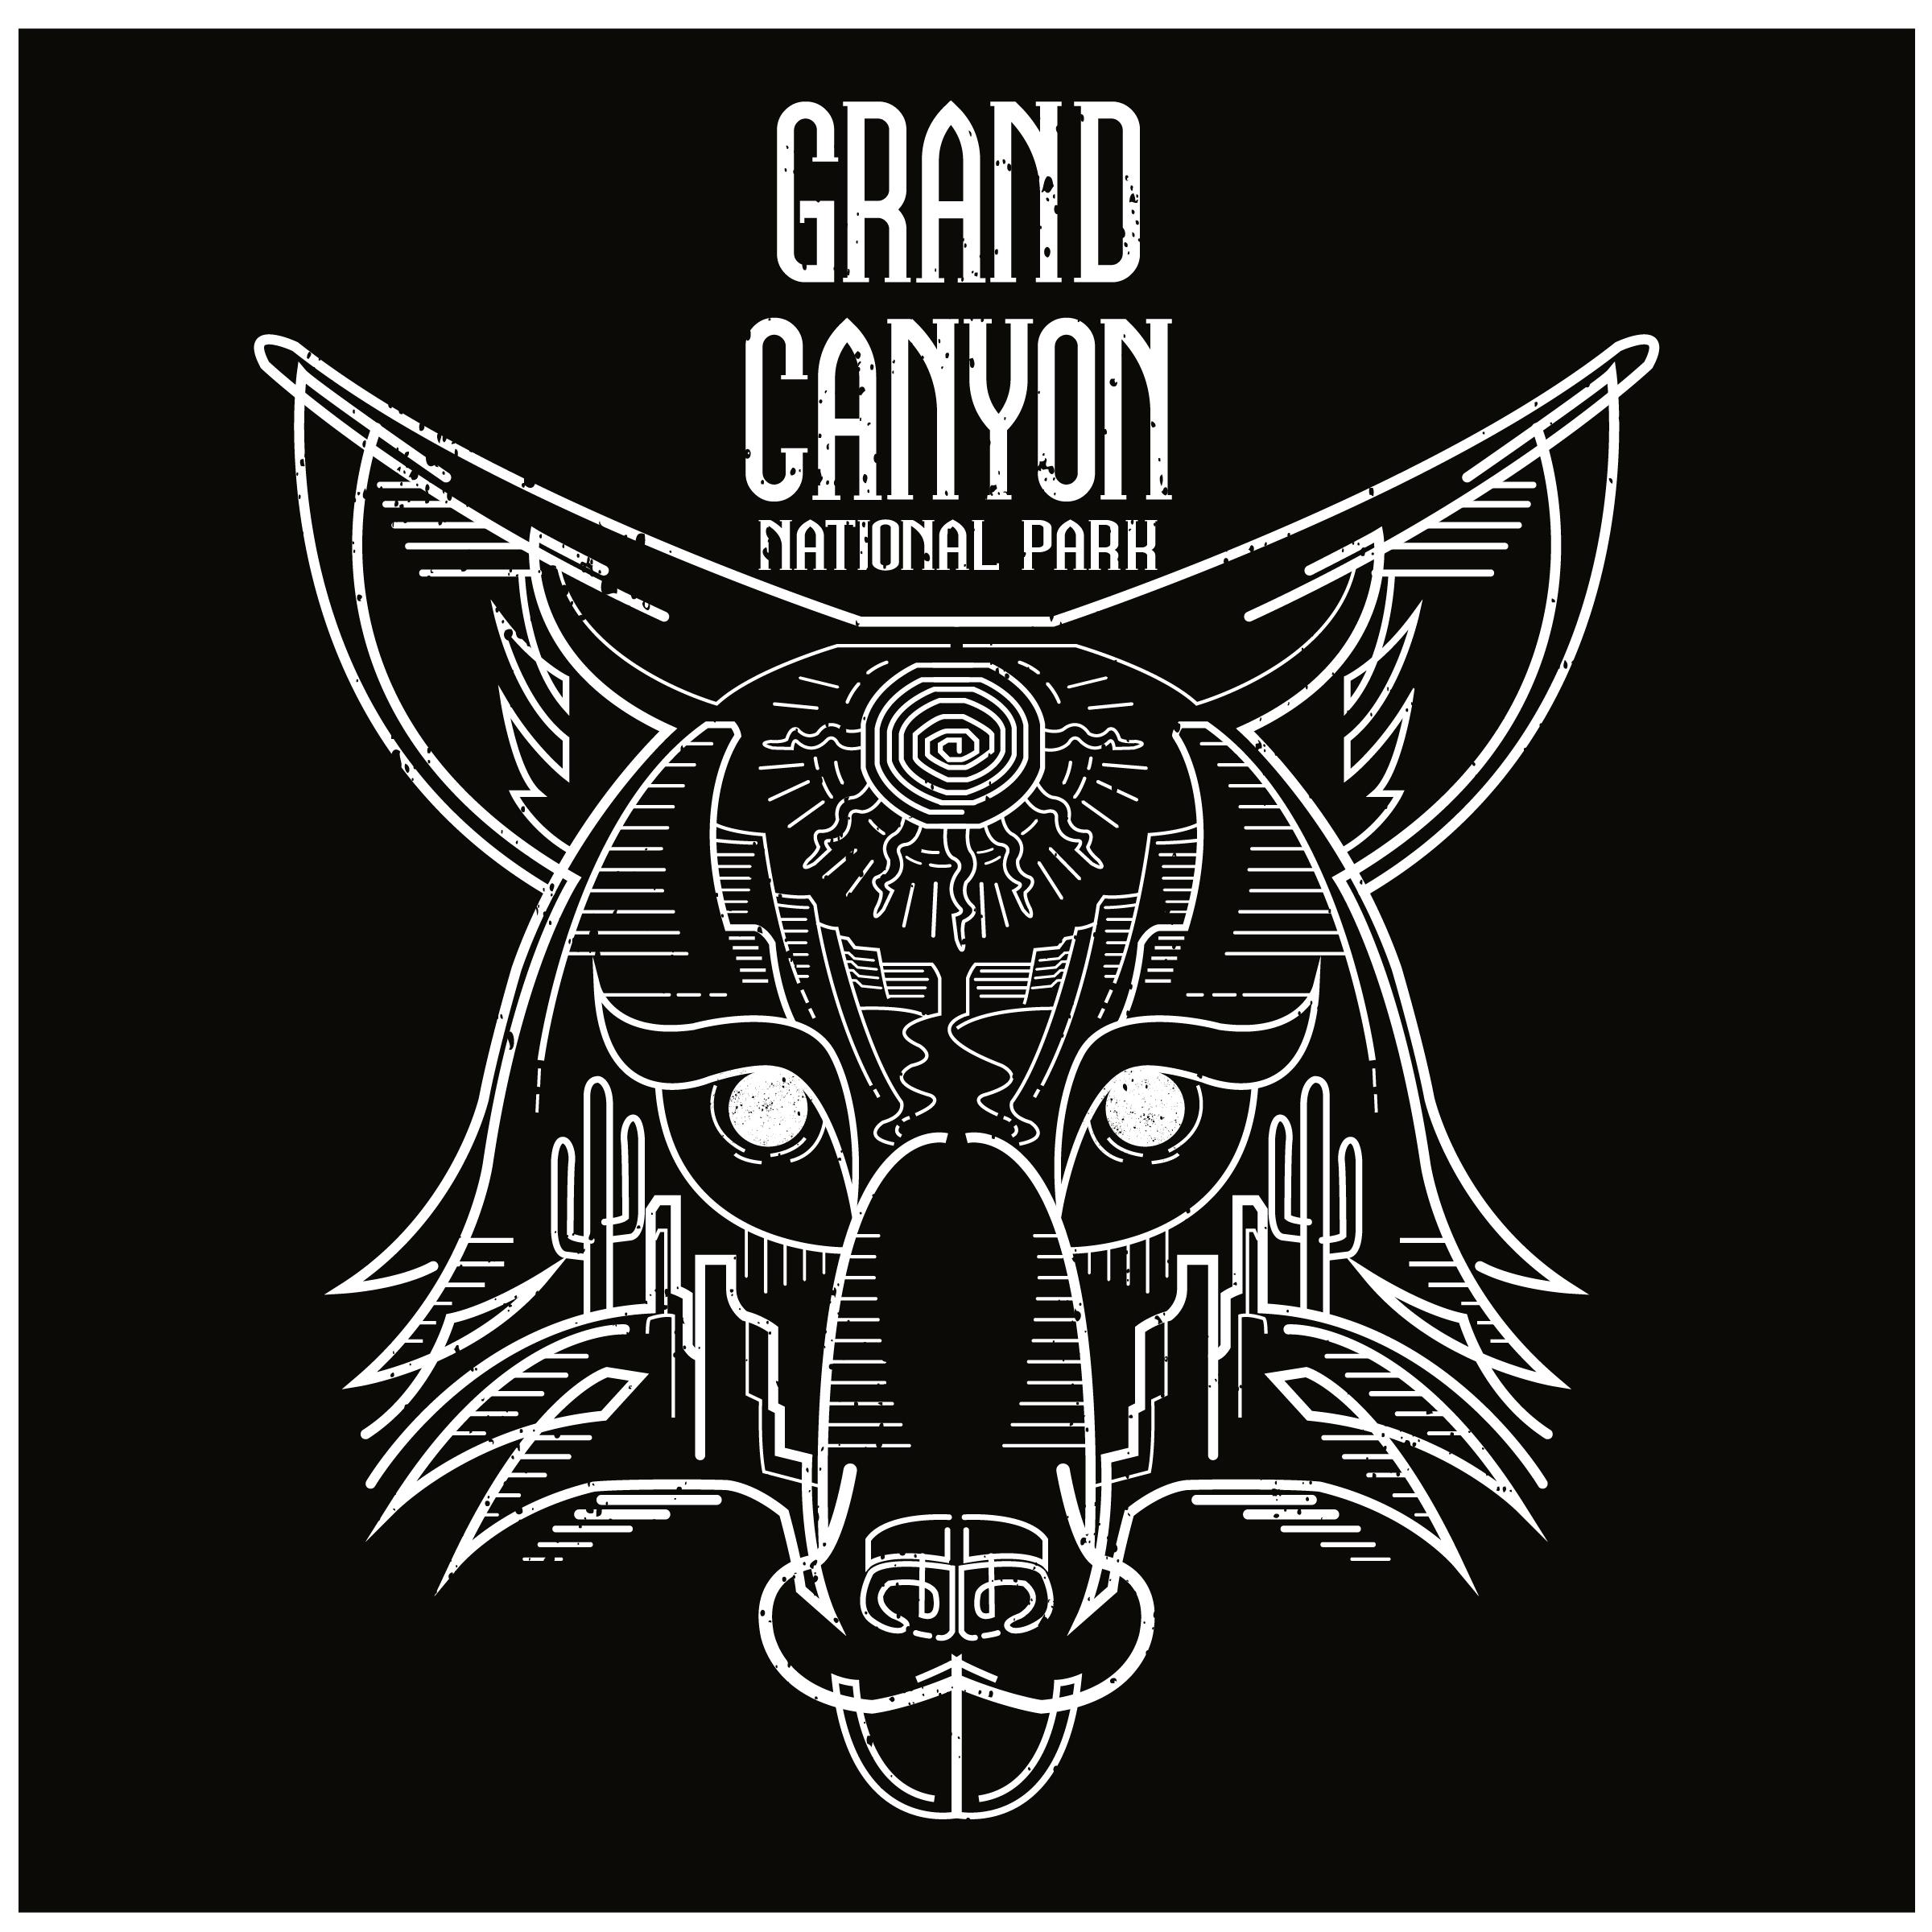 GrandCanyonShirtConcepts-02